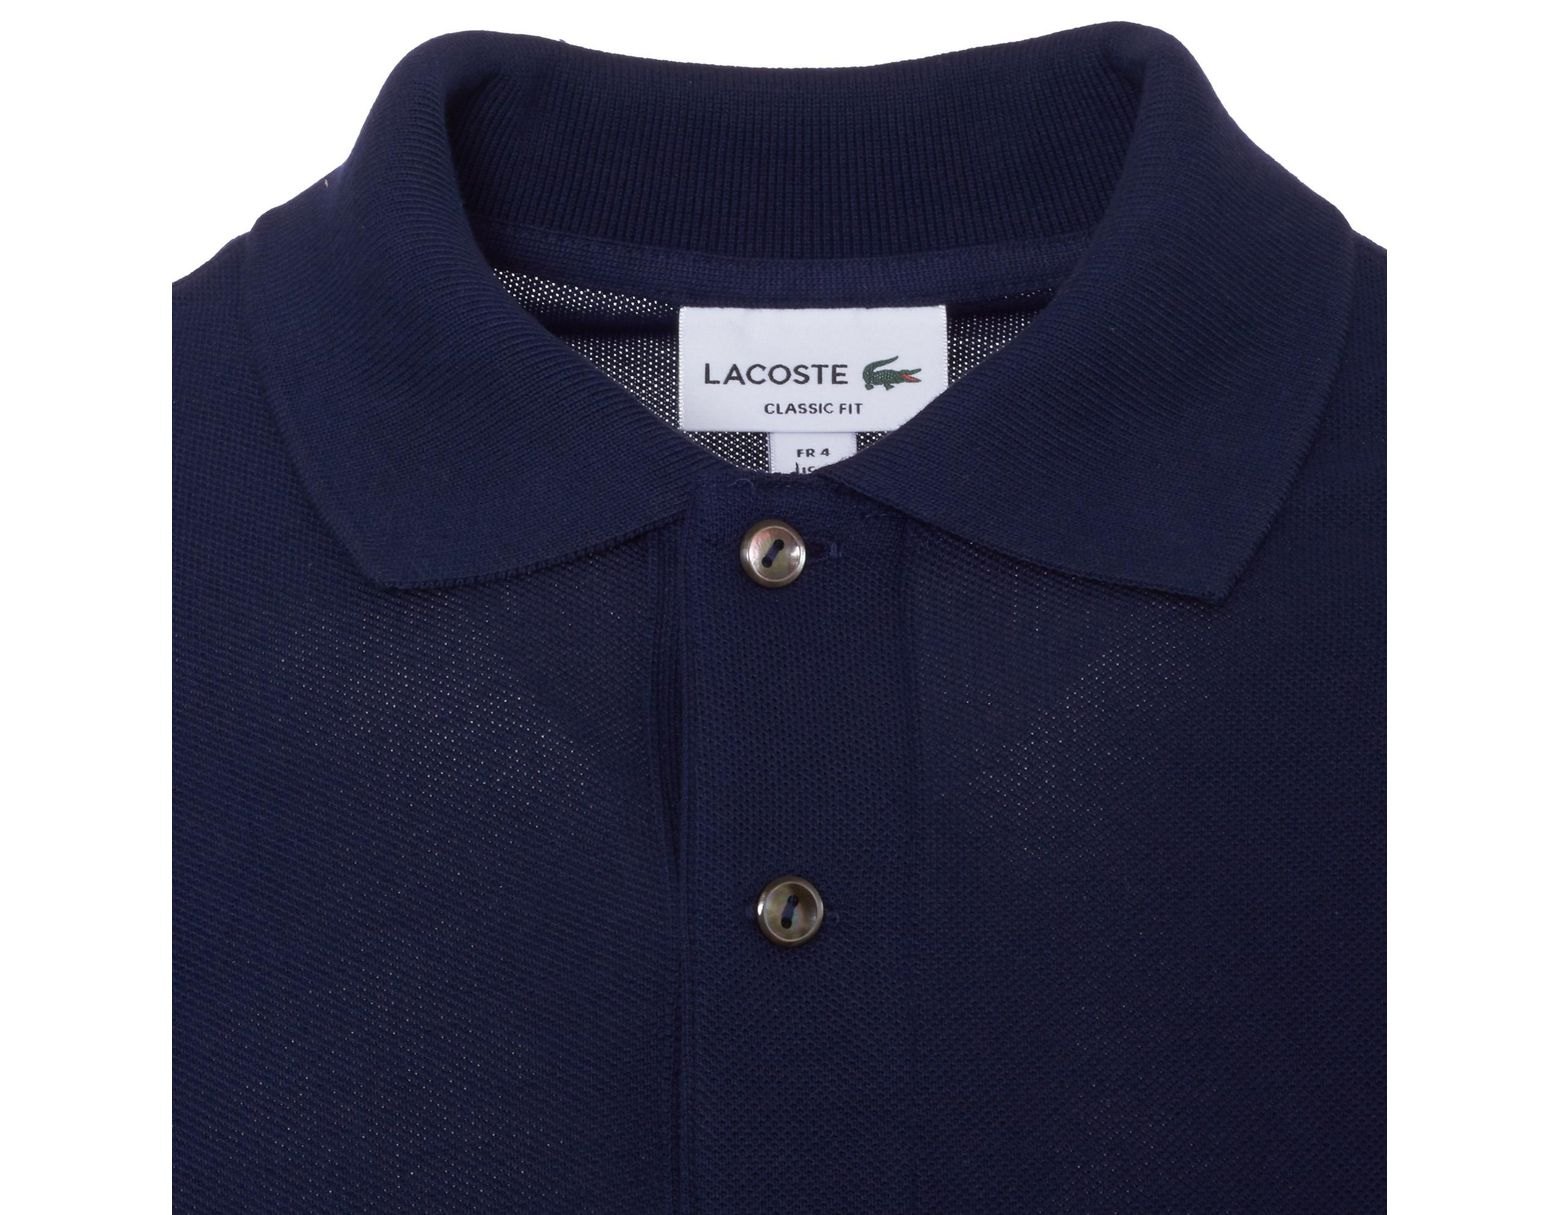 2308e0e9648 Lacoste Classic Pique Navy Polo Shirt L1212 00 166 in Blue for Men - Lyst